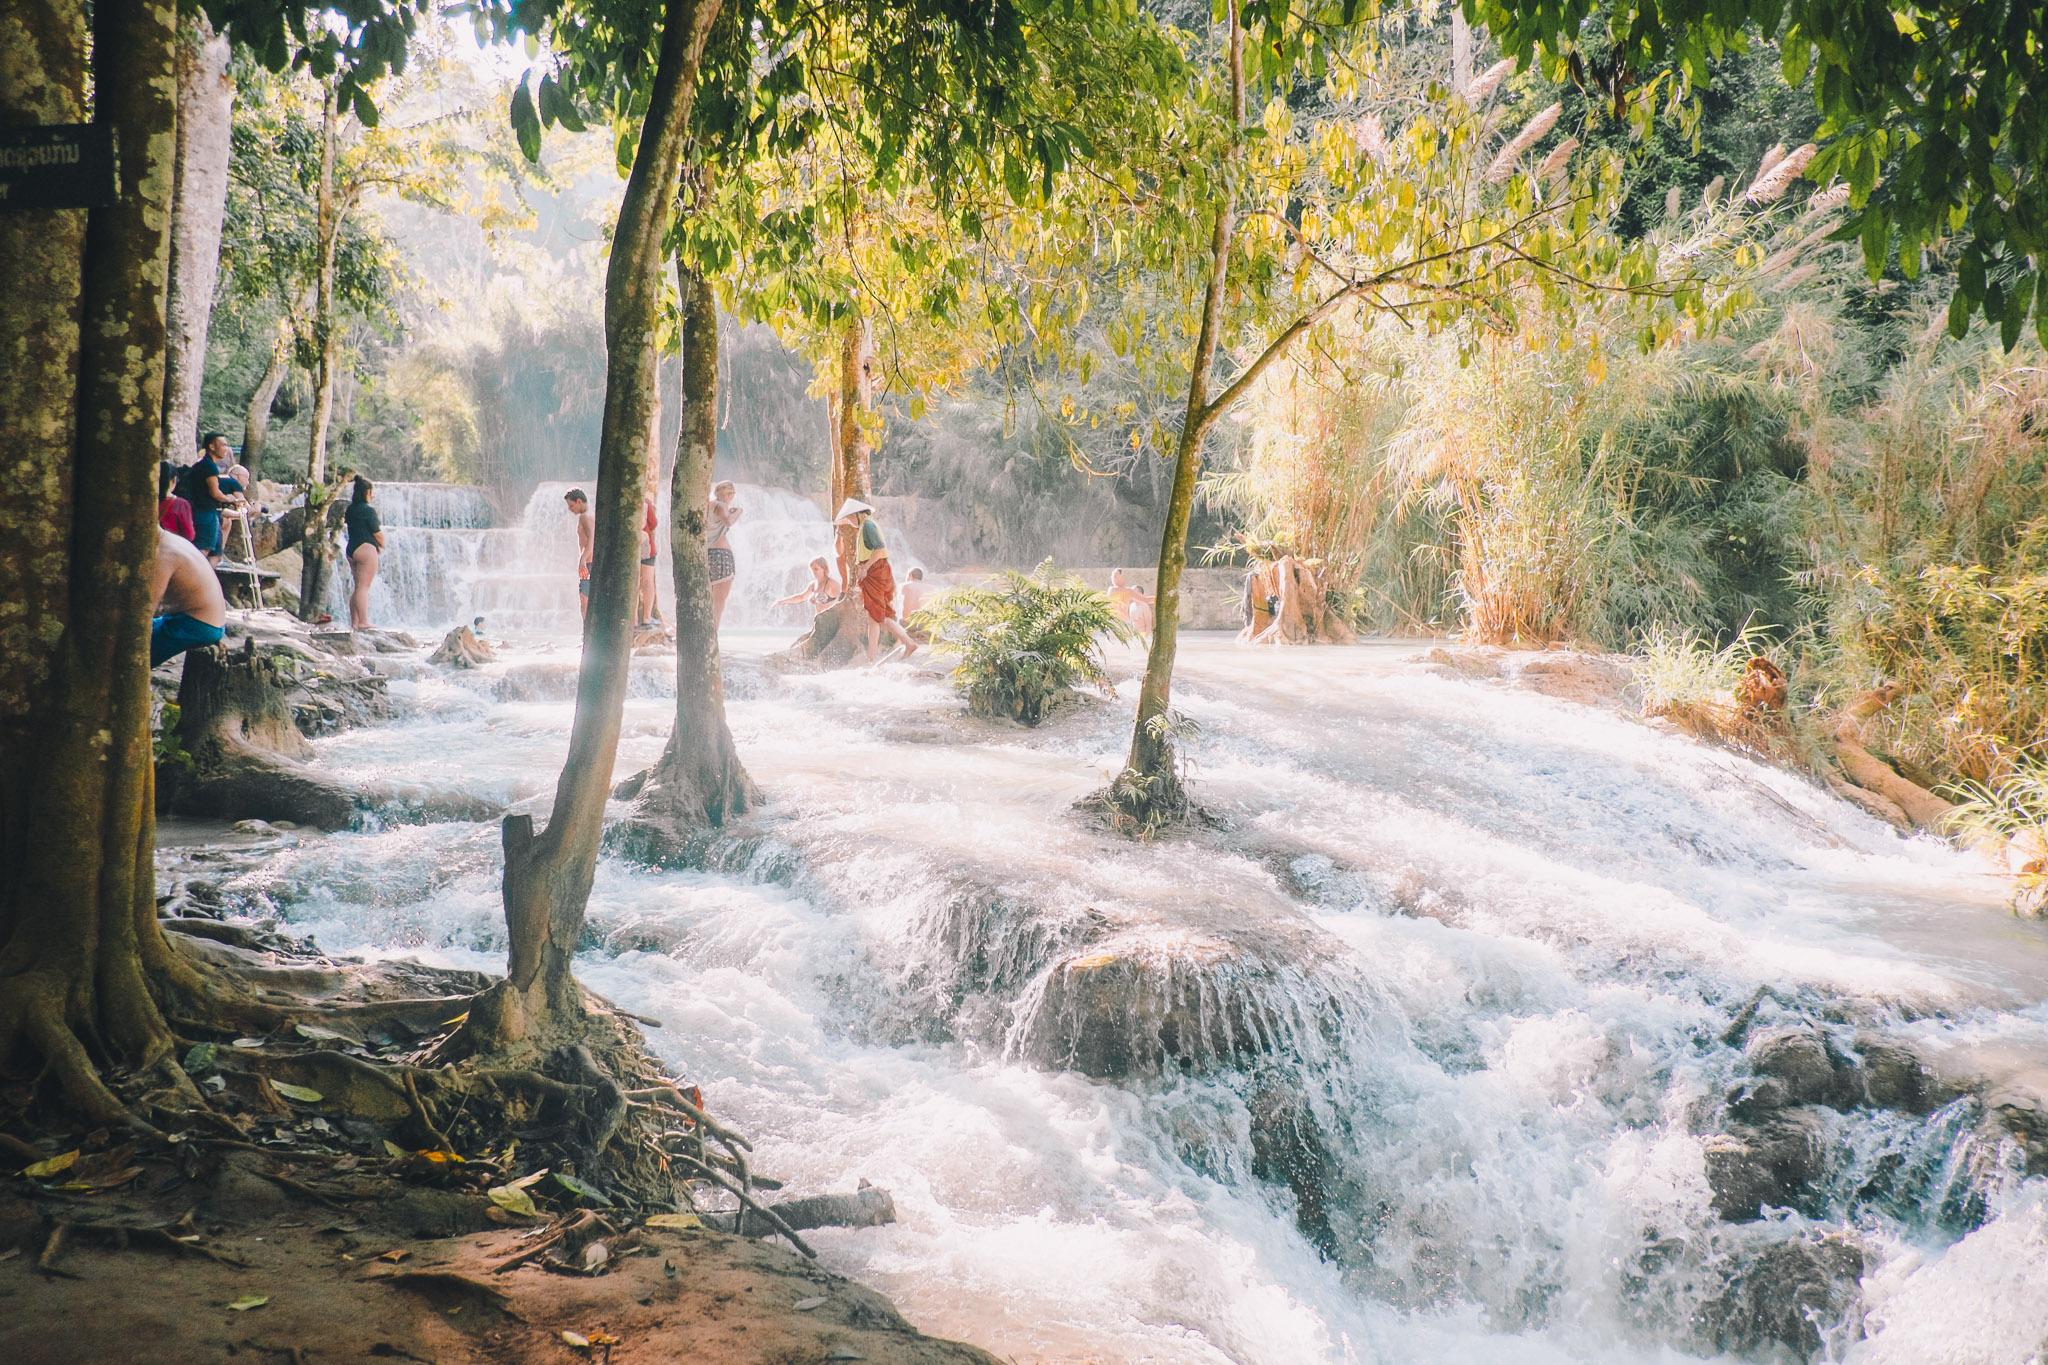 laos-luang-prabang-kuang-si-falls-6.jpg